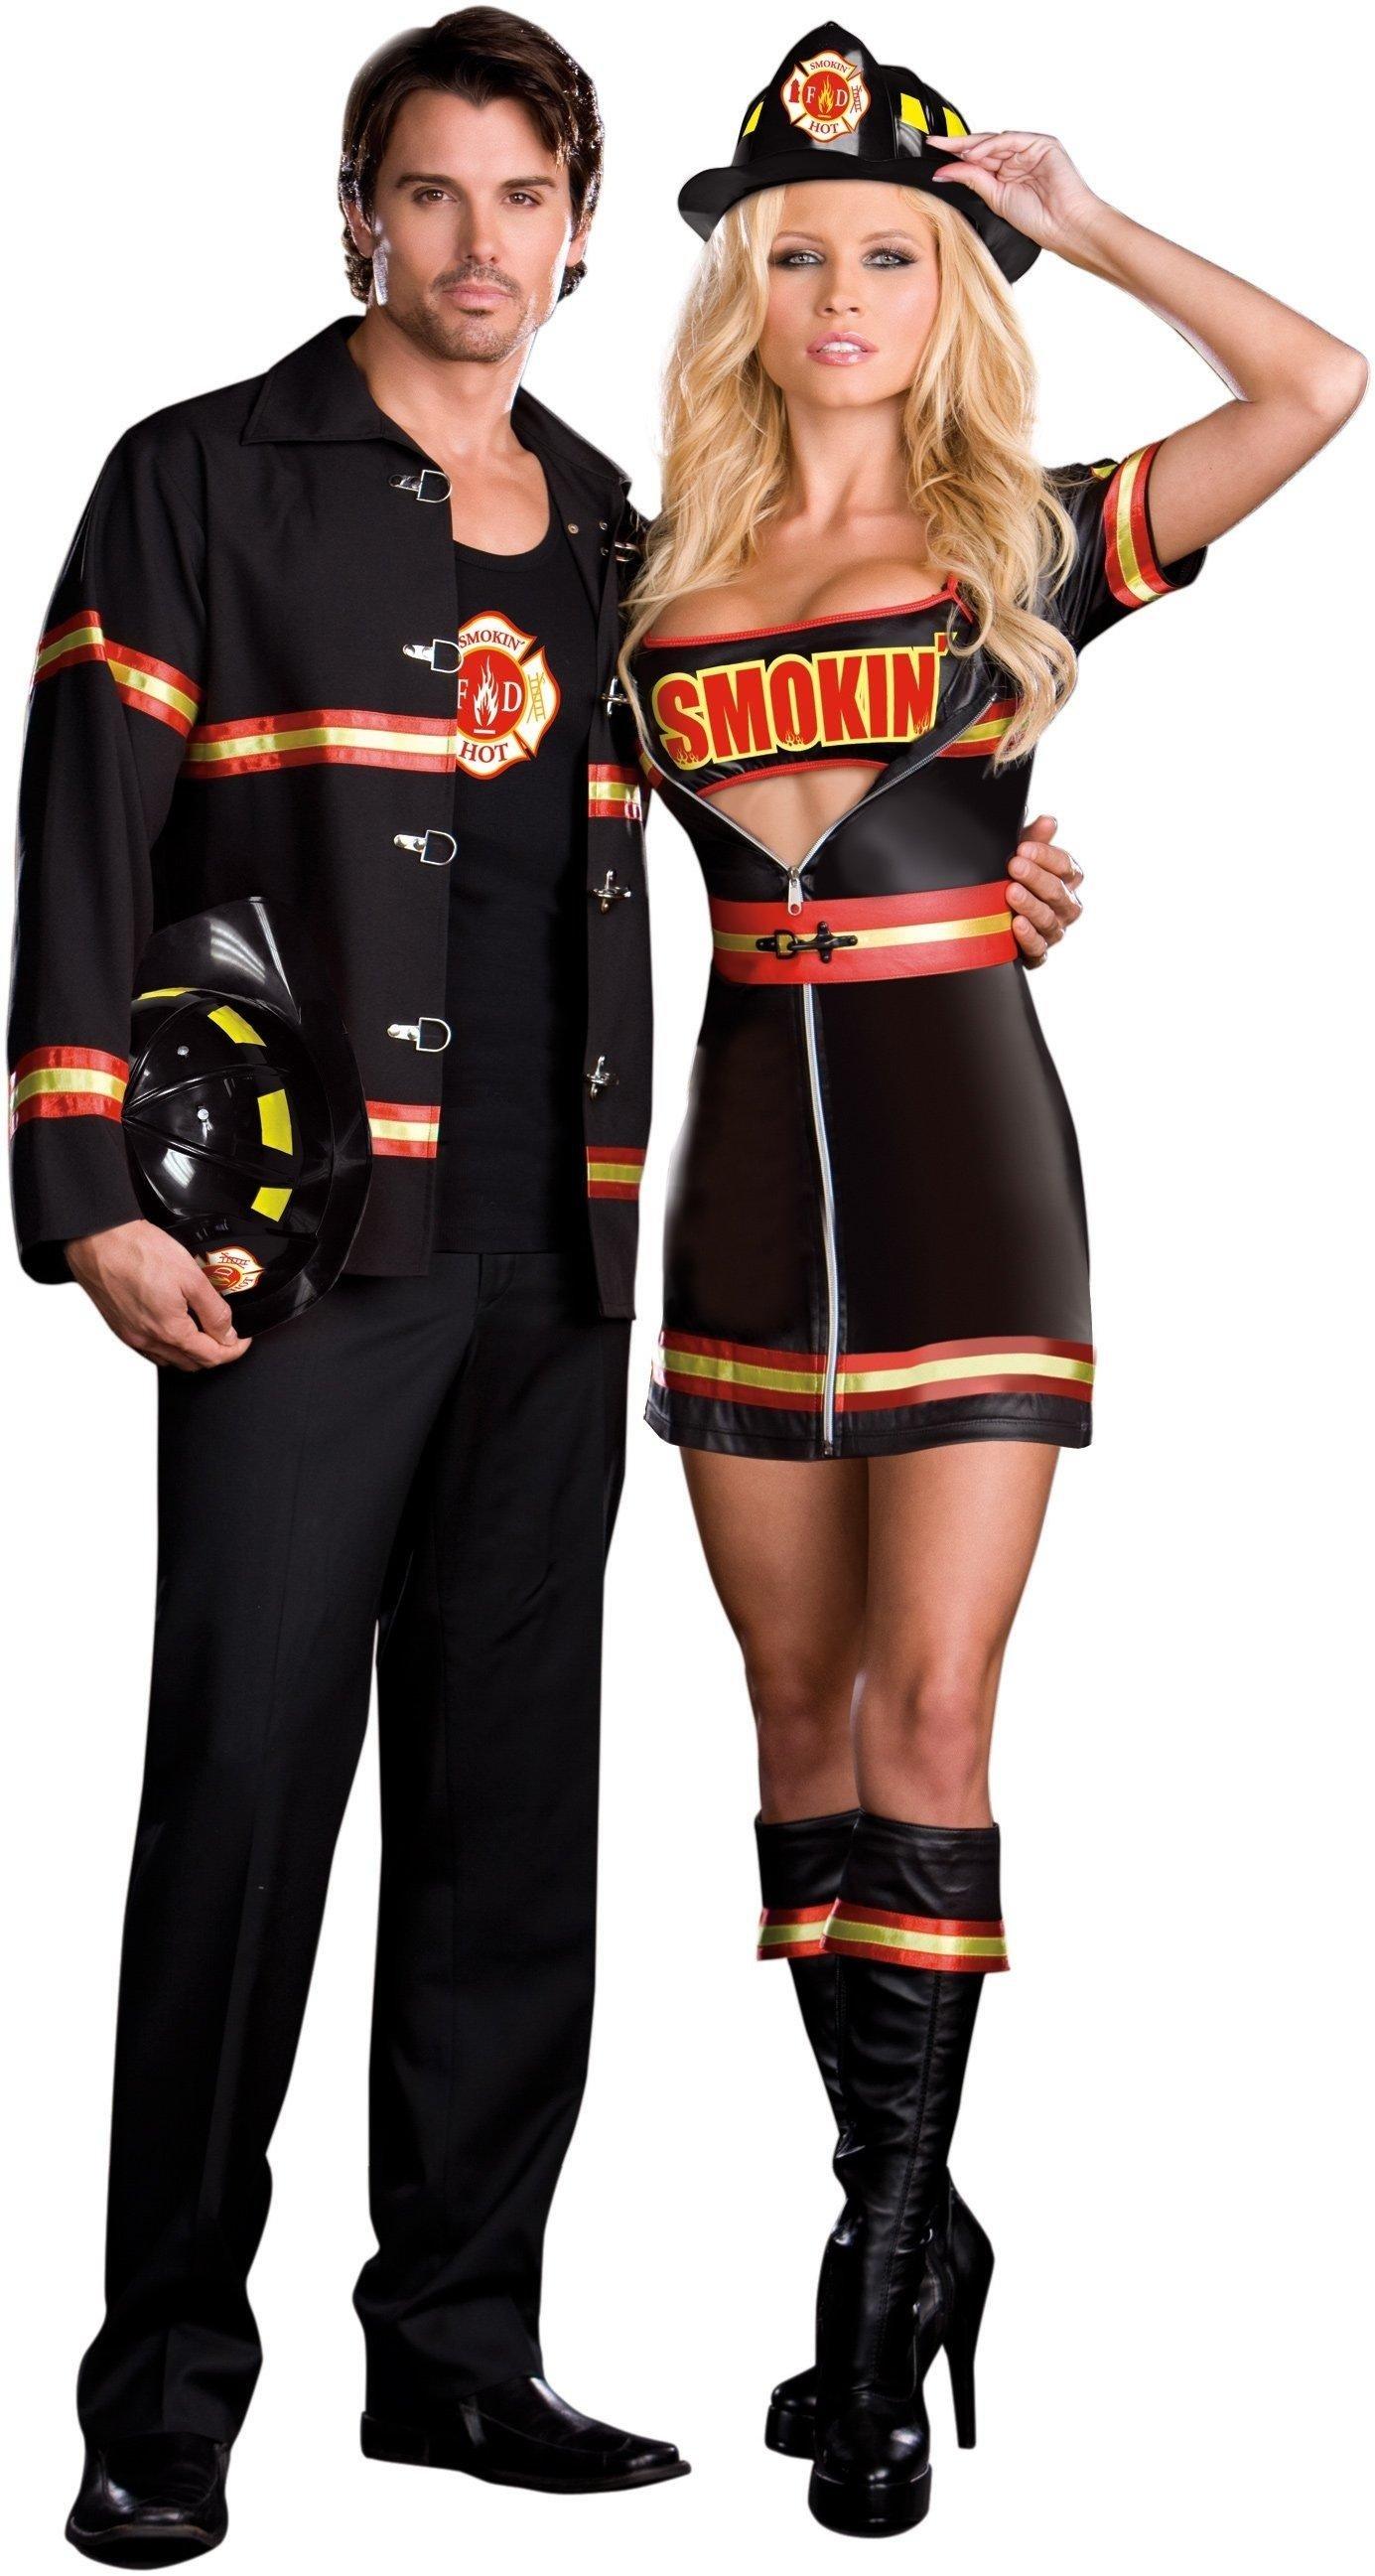 10 stylish cute couples halloween costume ideas 35 couples halloween costumes ideas inspirationseek 1